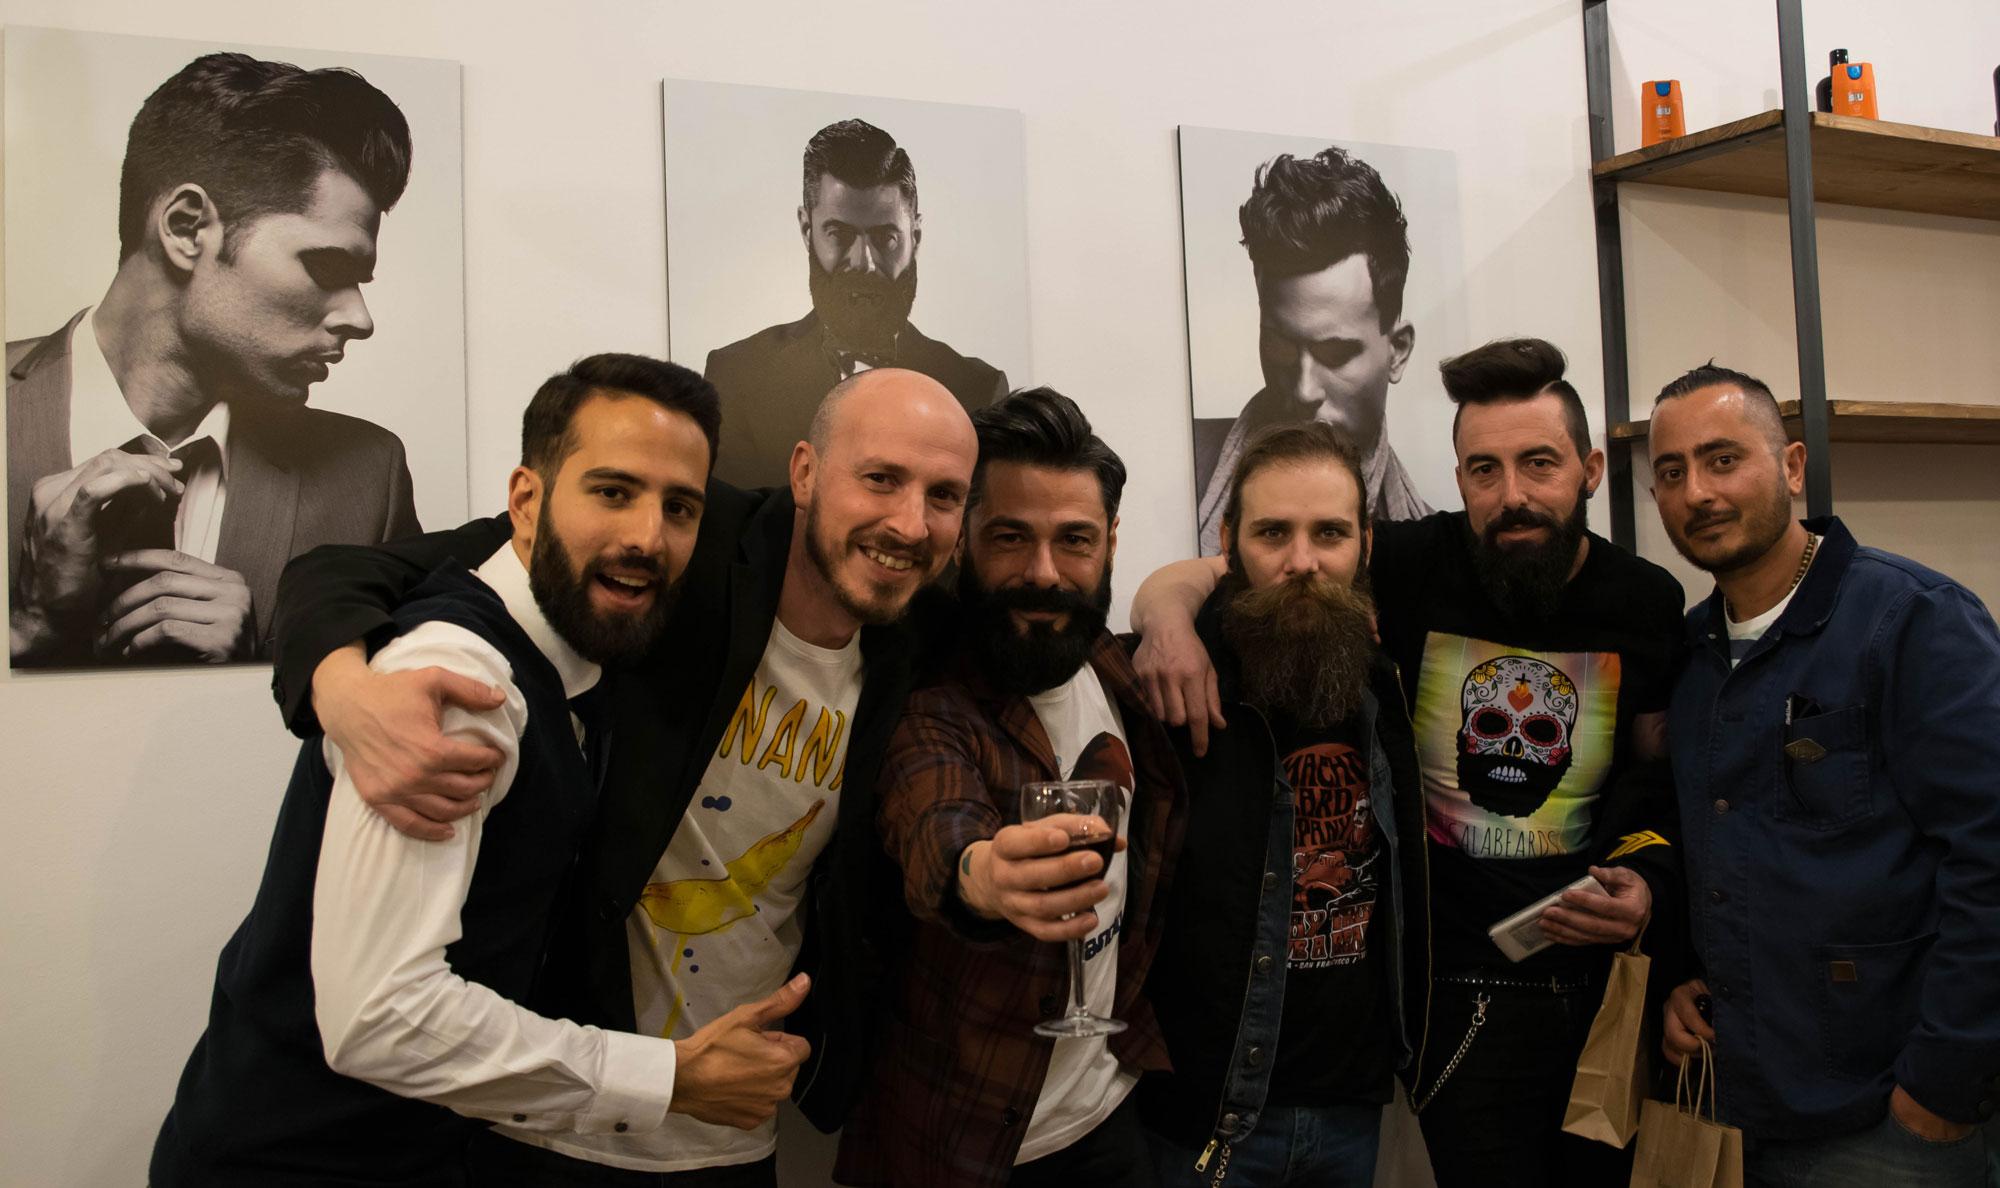 Inauguraci n de la barber a del norte en bilbao - La barberia de vigo ...